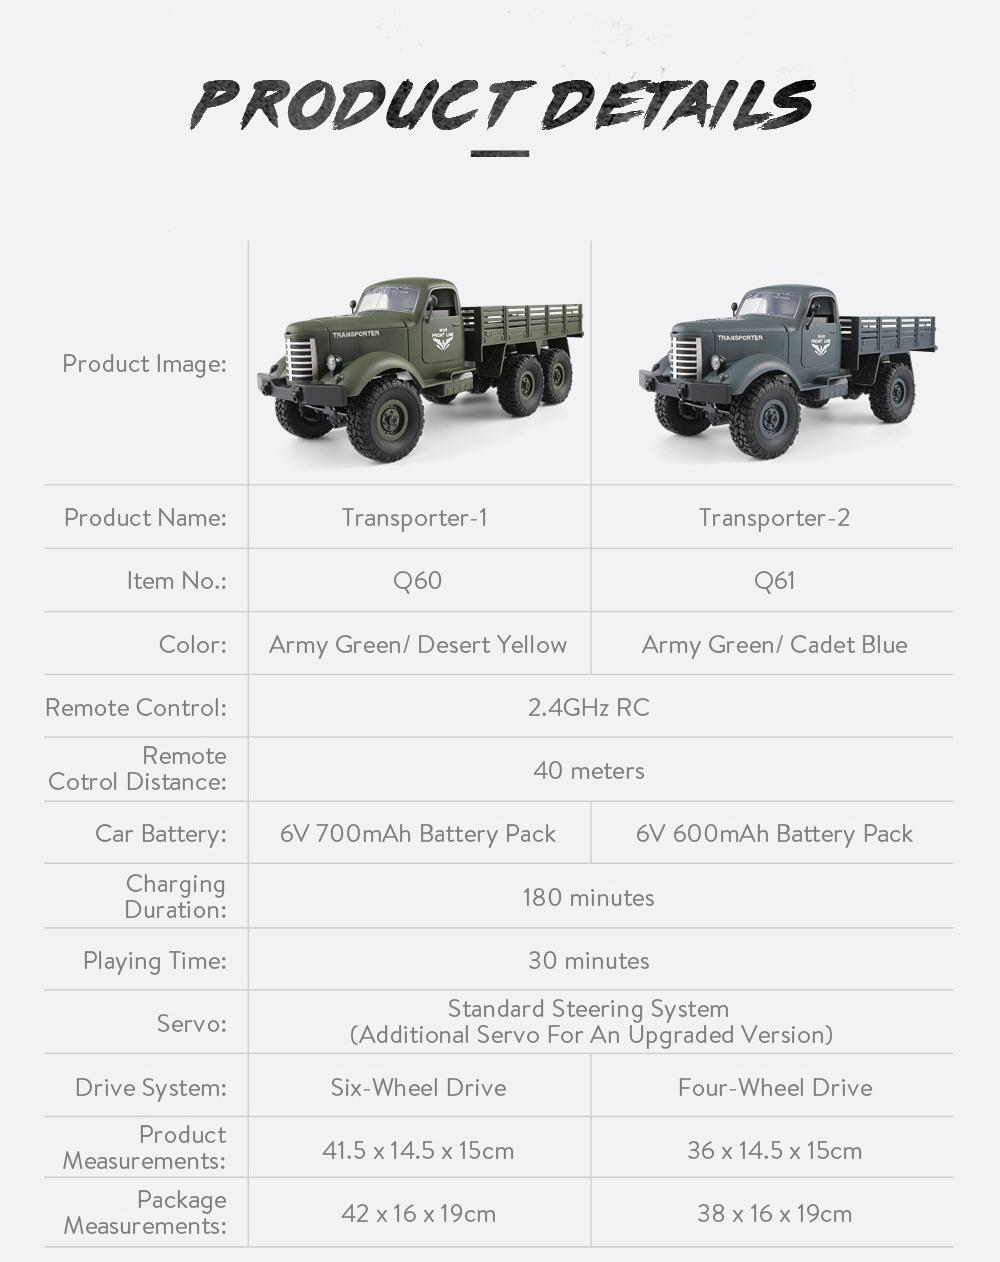 JJRC Q60 1/16 2.4G 6WD Off-Road Military Truck Crawler RC